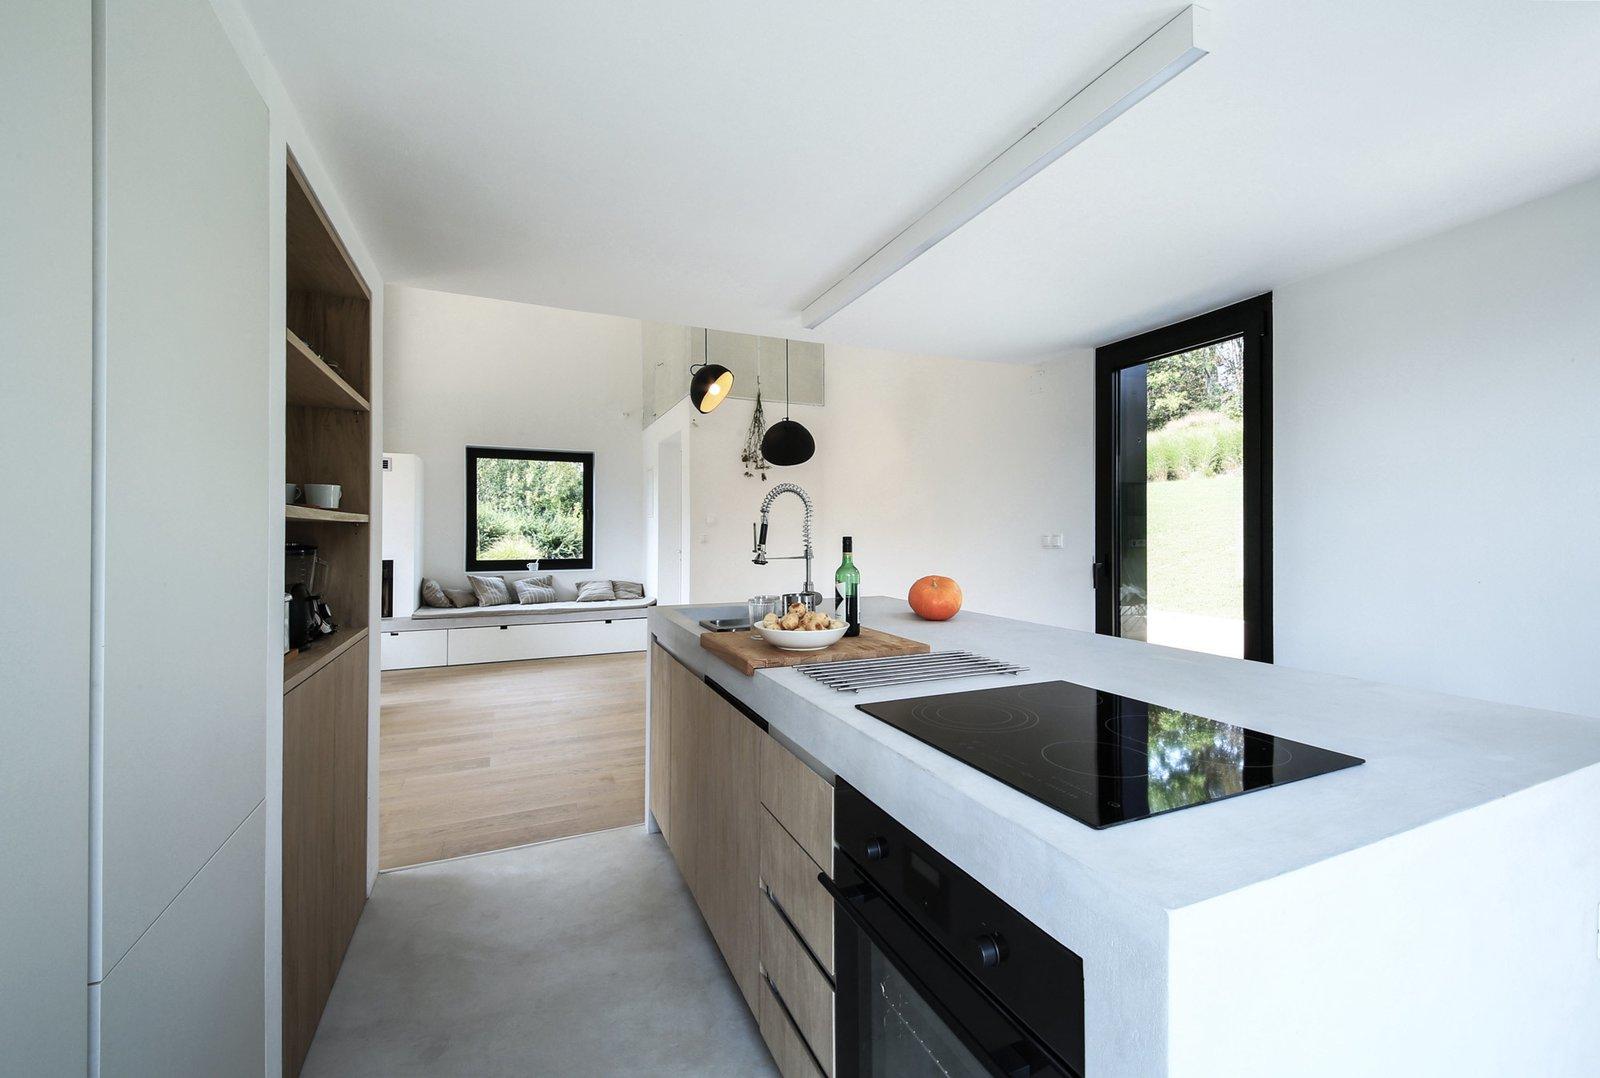 Kitchen  Photo 6 of 12 in Gorski Kotar House